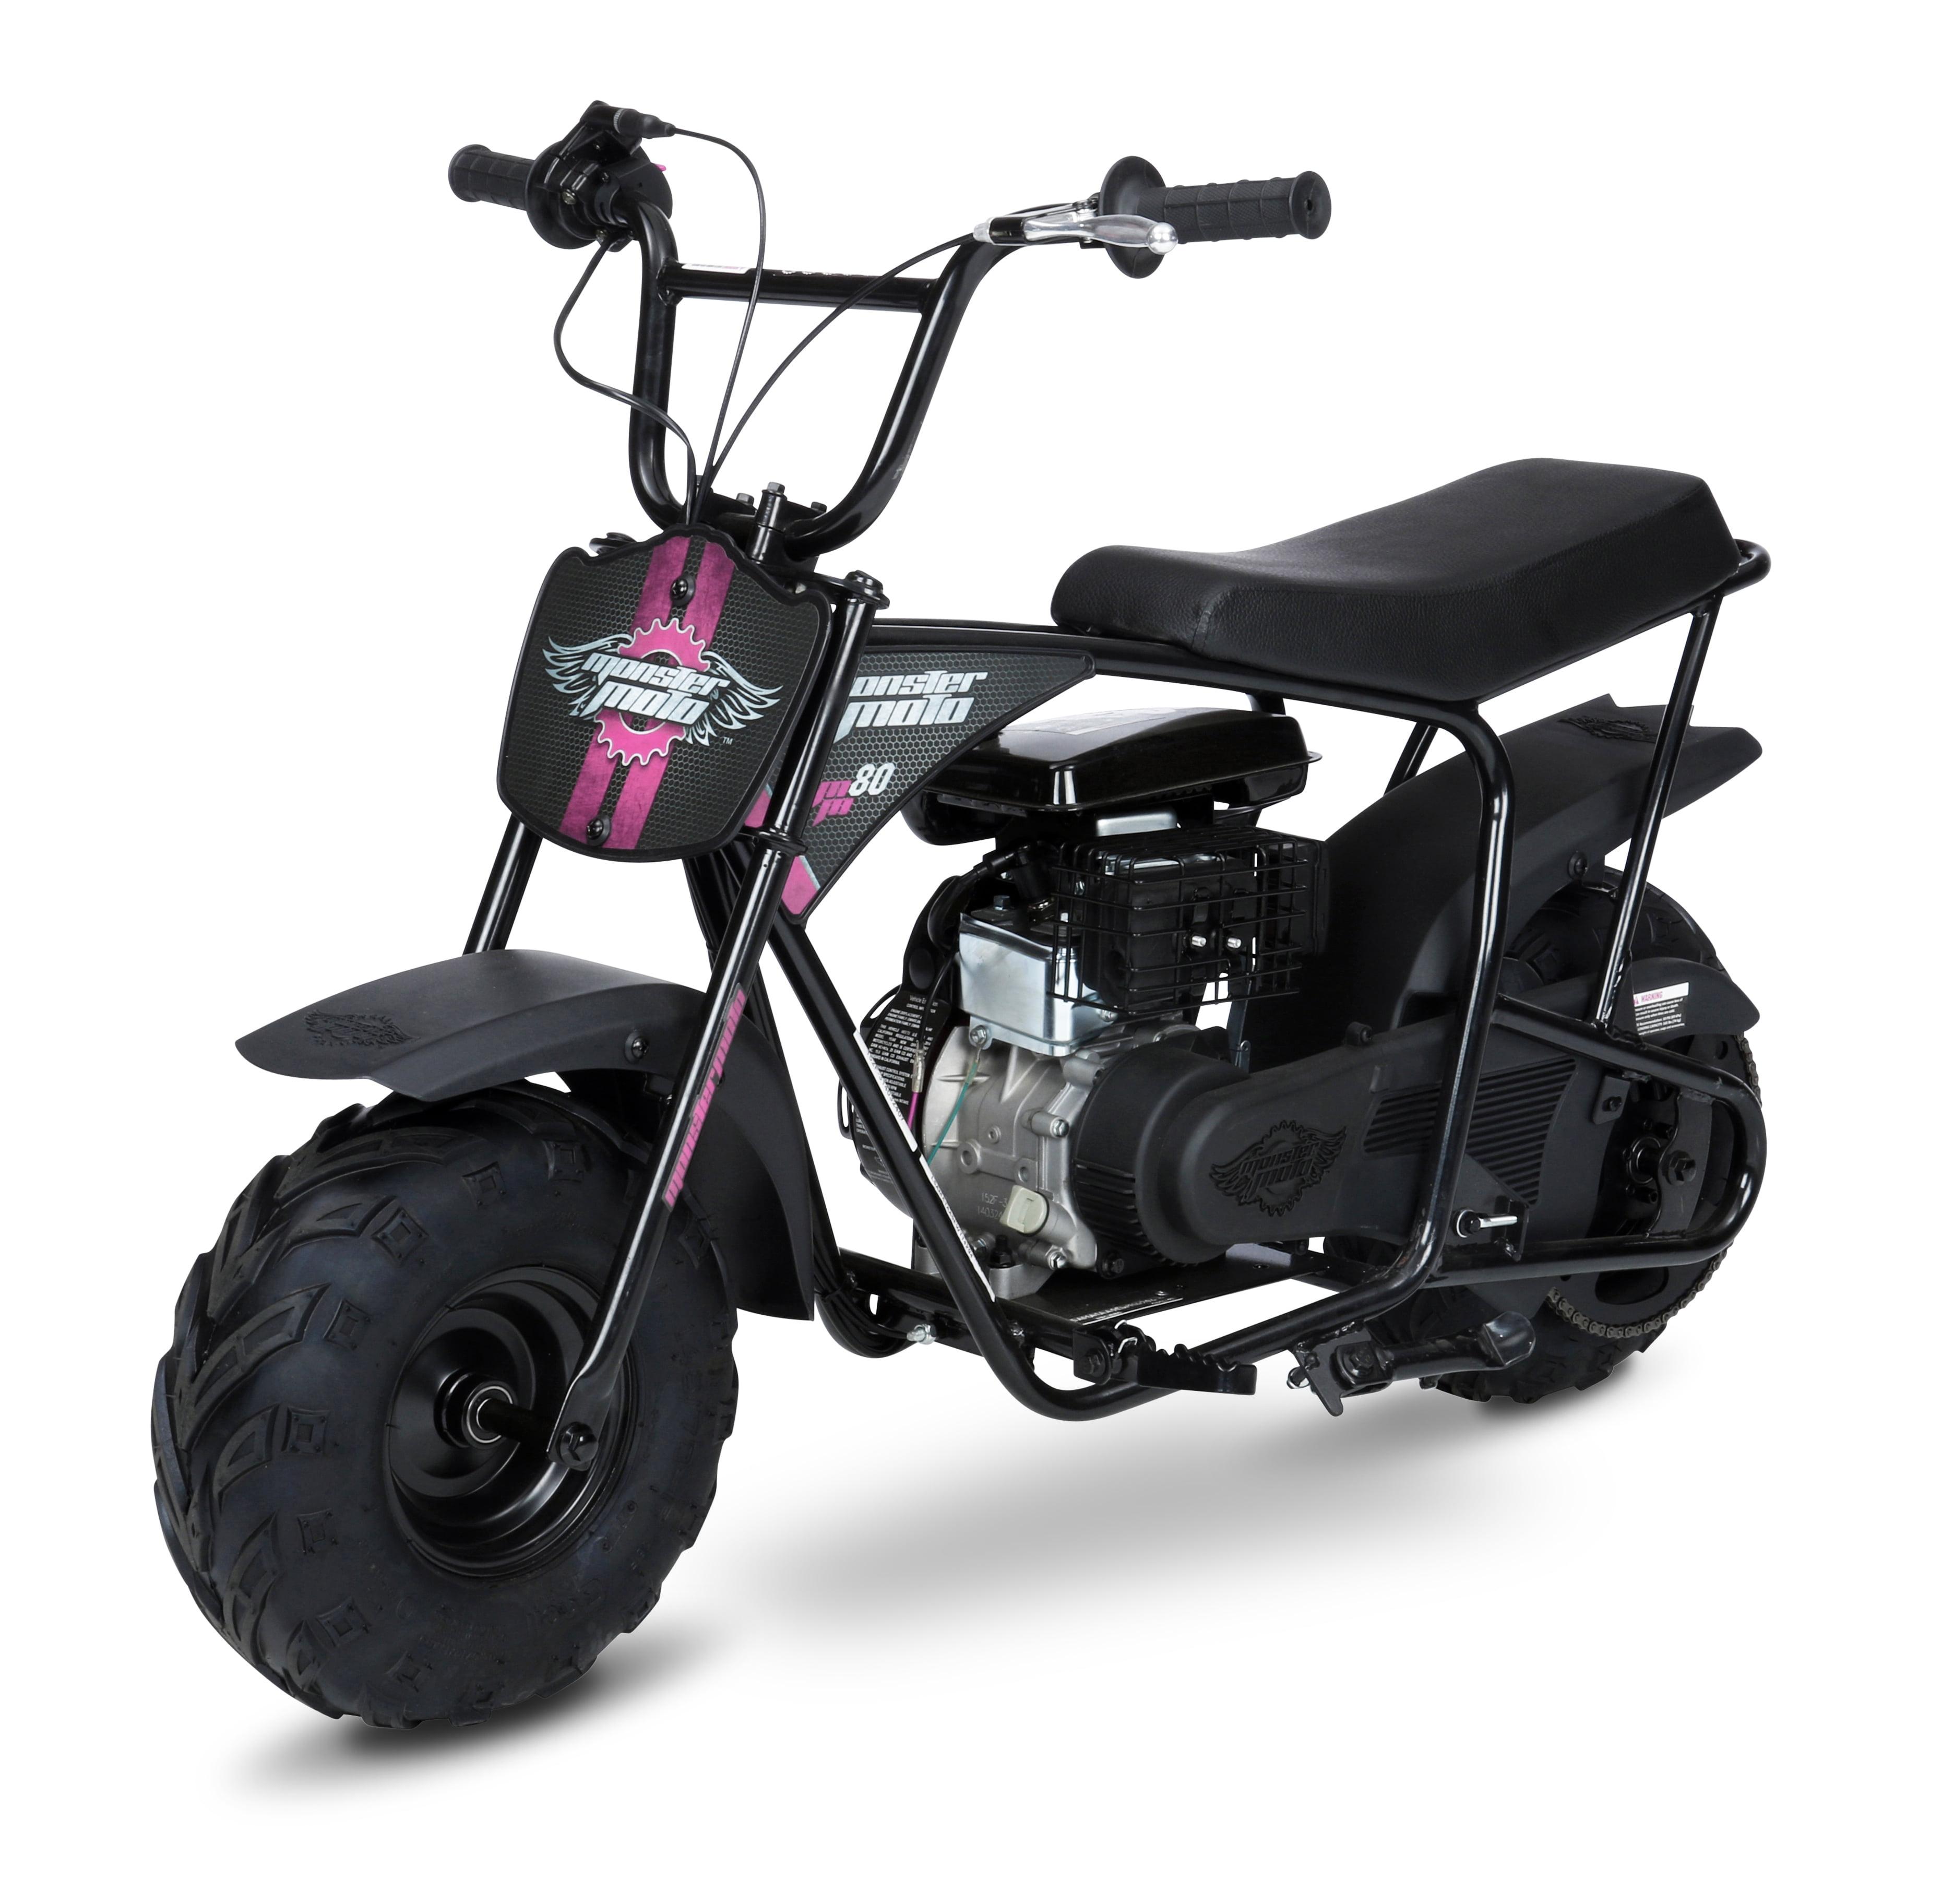 Mega Moto 80cc Mini Bike- Black with Red & Pink Decals